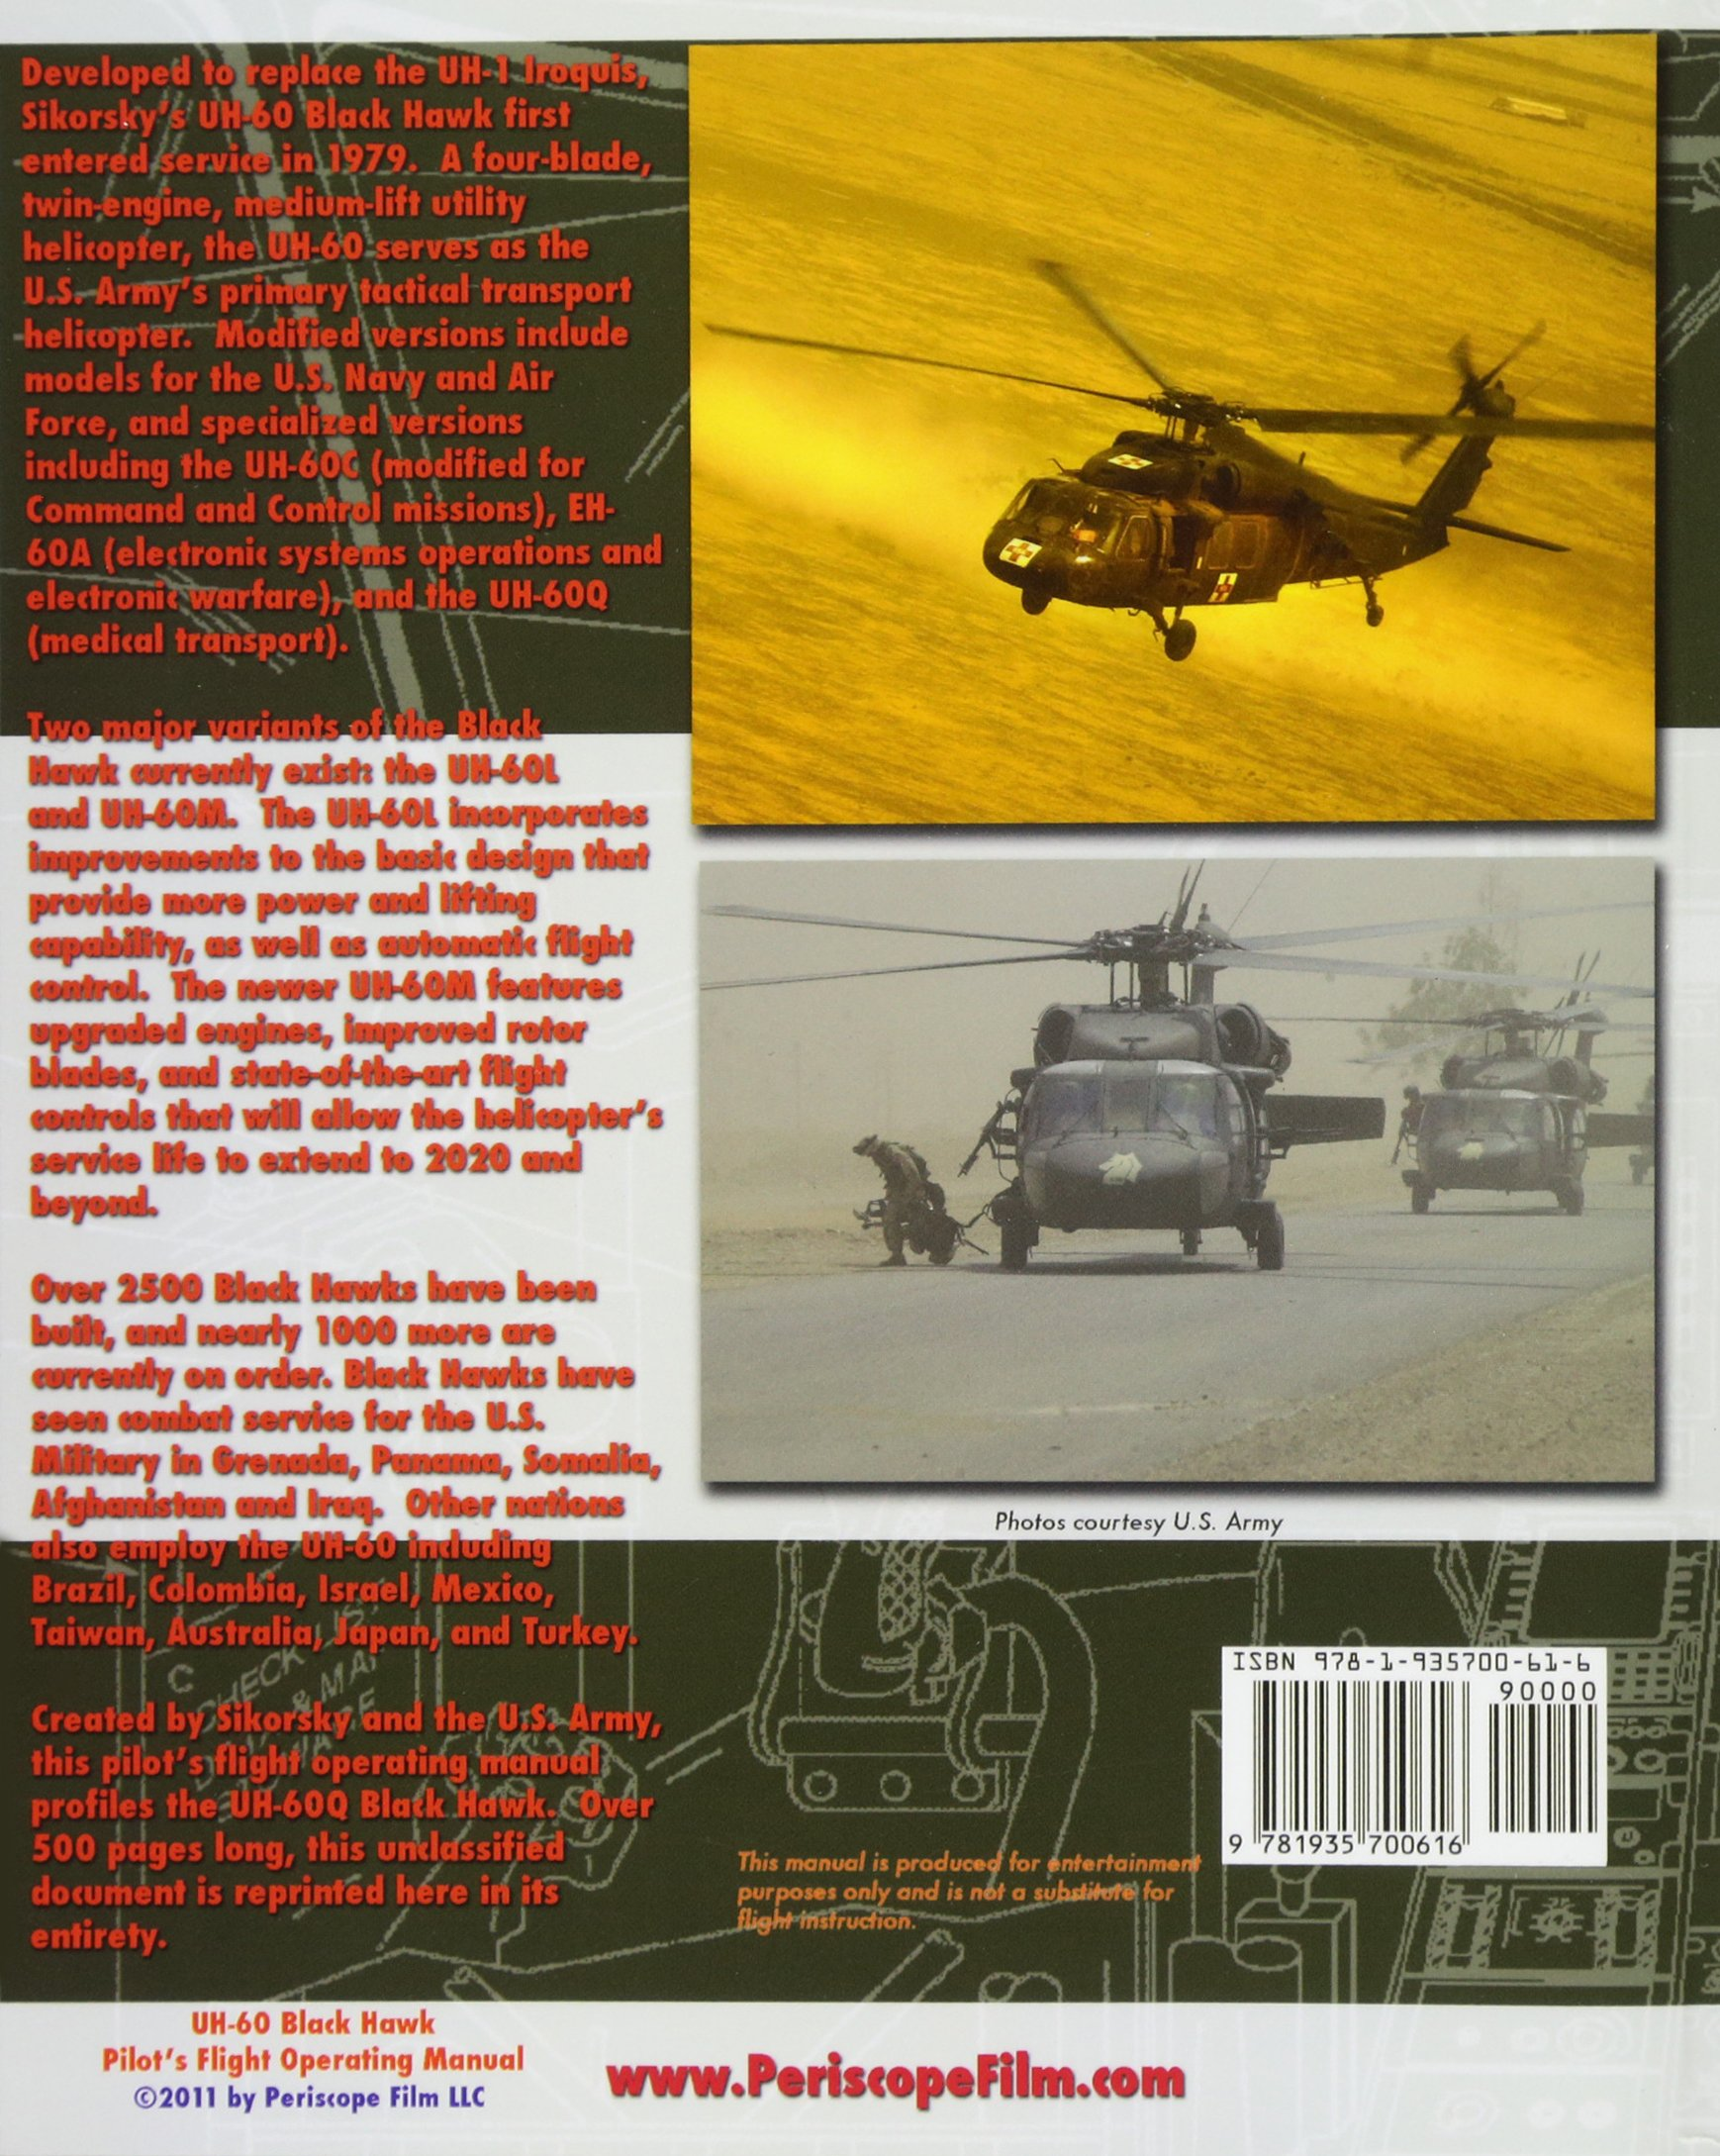 UH-60 Black Hawk Pilot's Flight Operating Manual: Department of the Army:  9781935700616: Amazon.com: Books